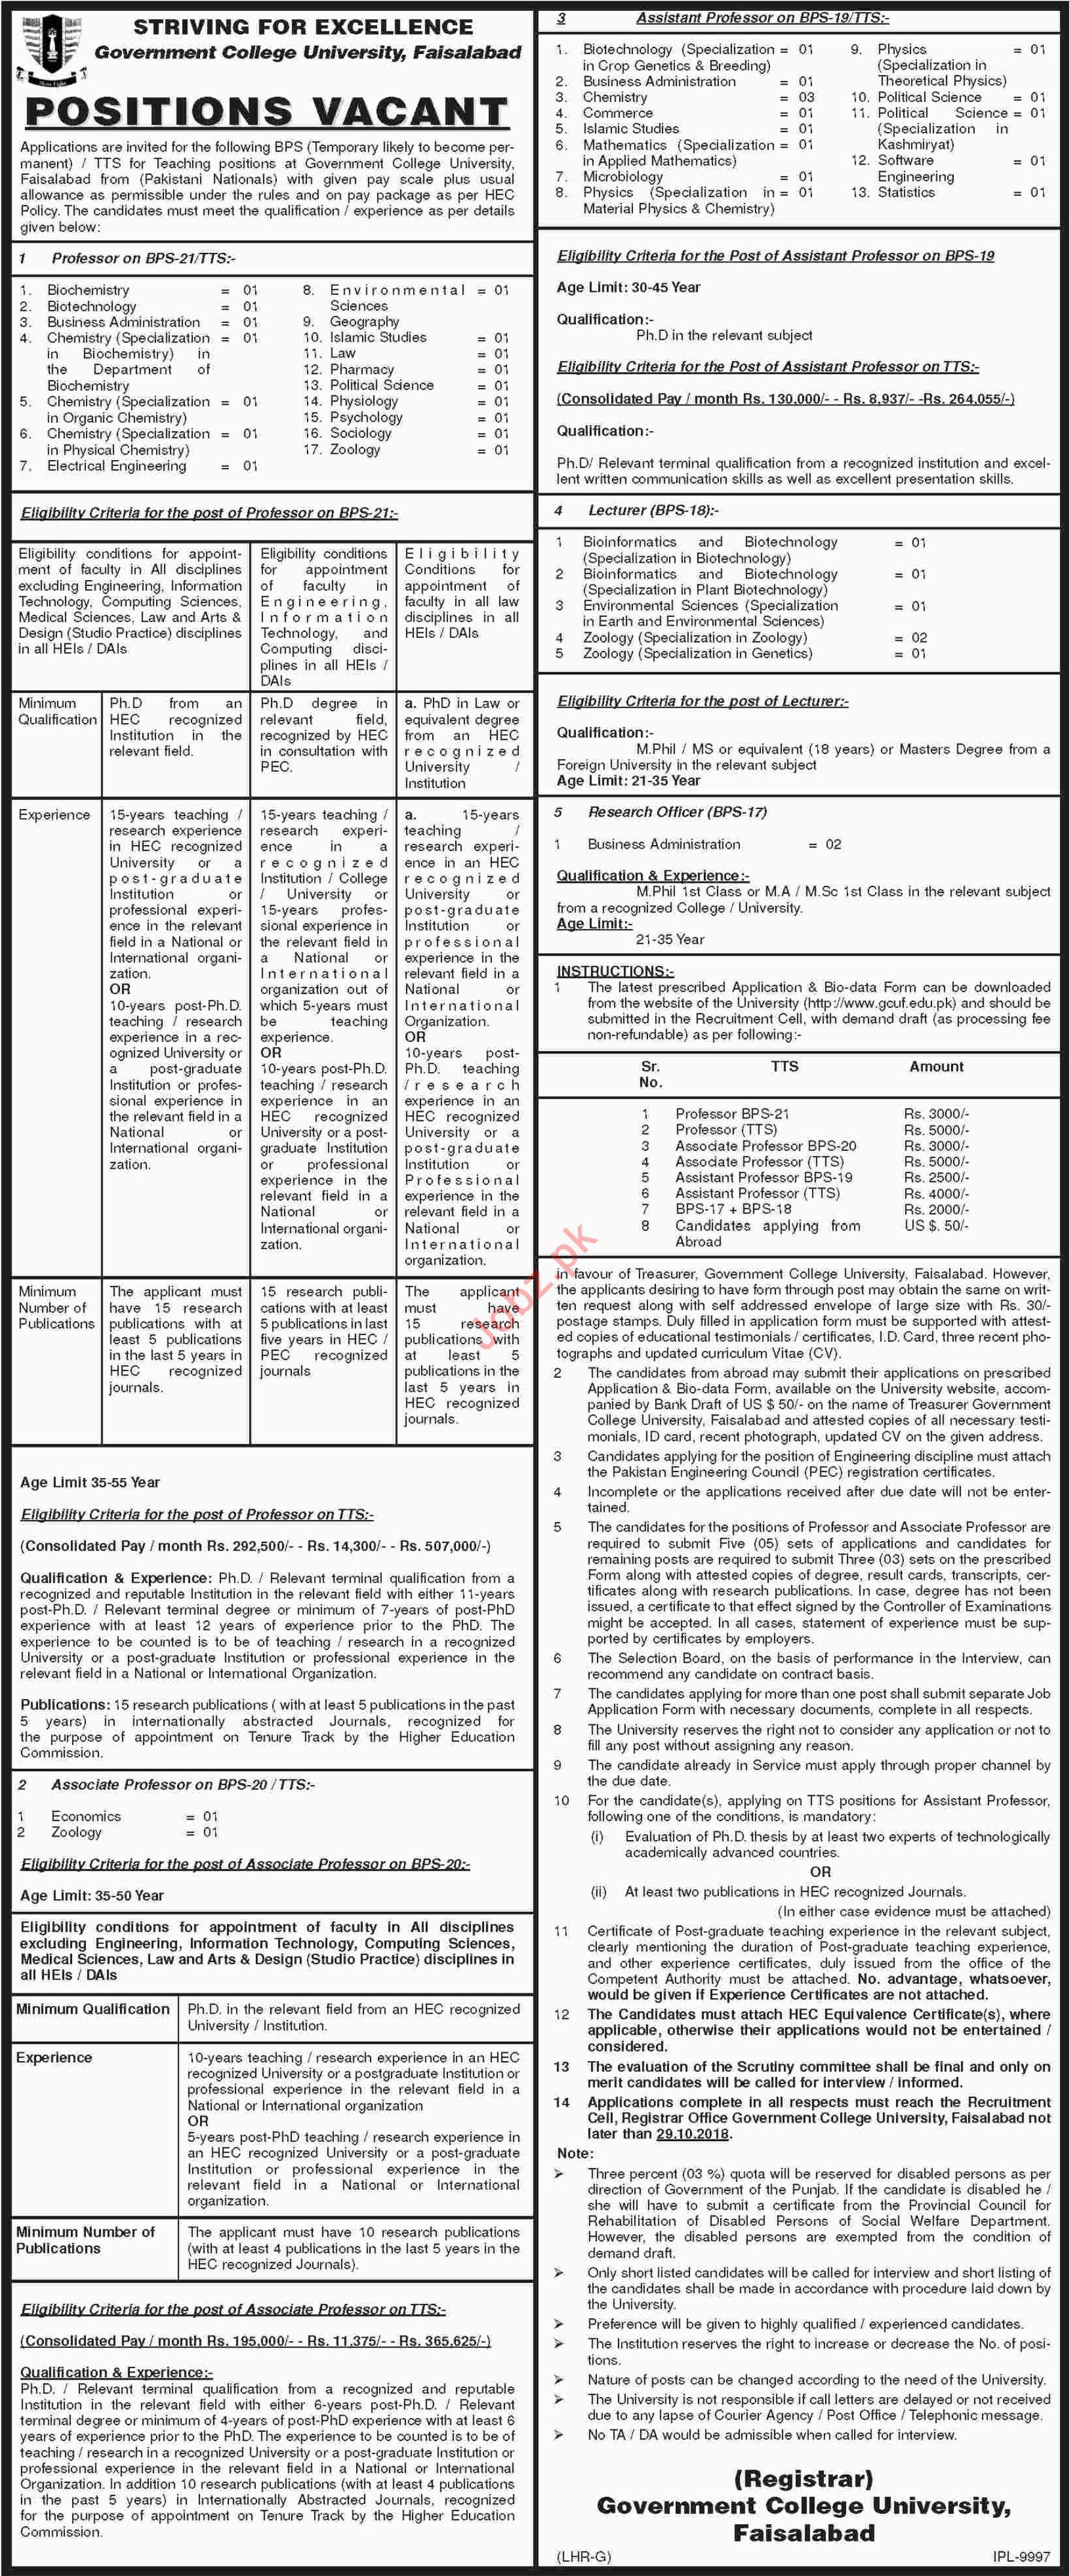 GCUF University Faisalabad Jobs for Professors & Lecturers